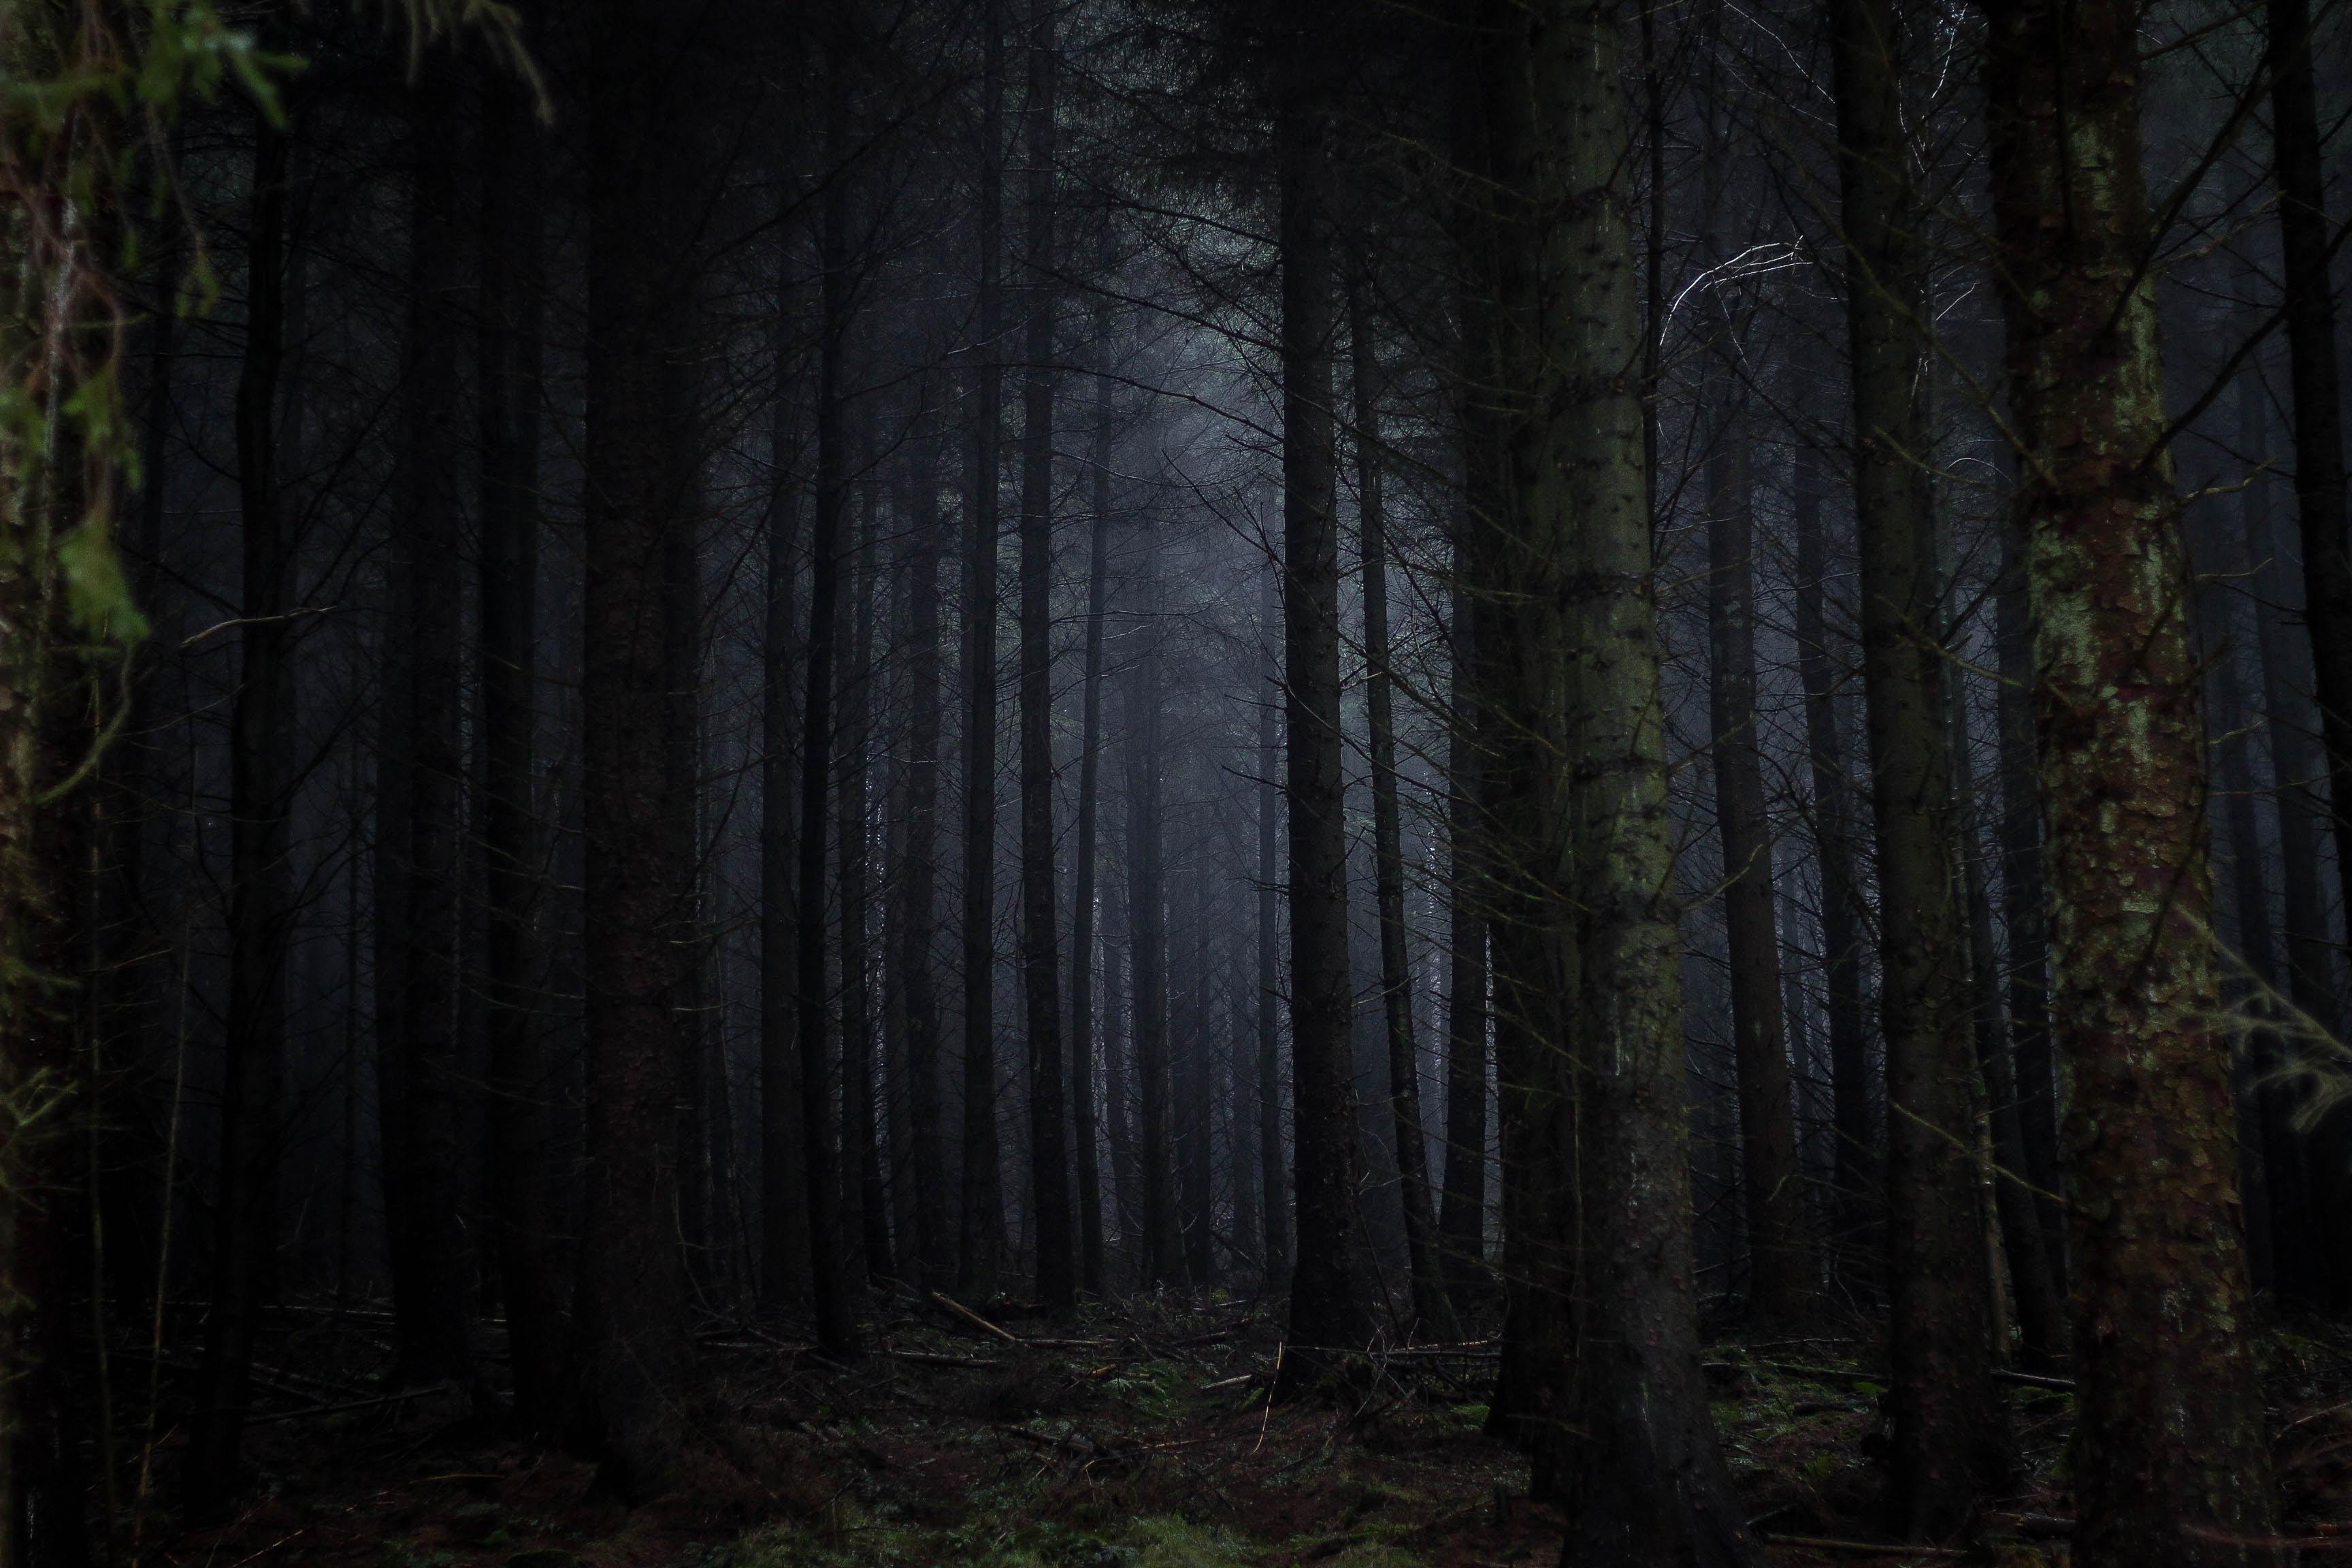 A dark coniferous forest